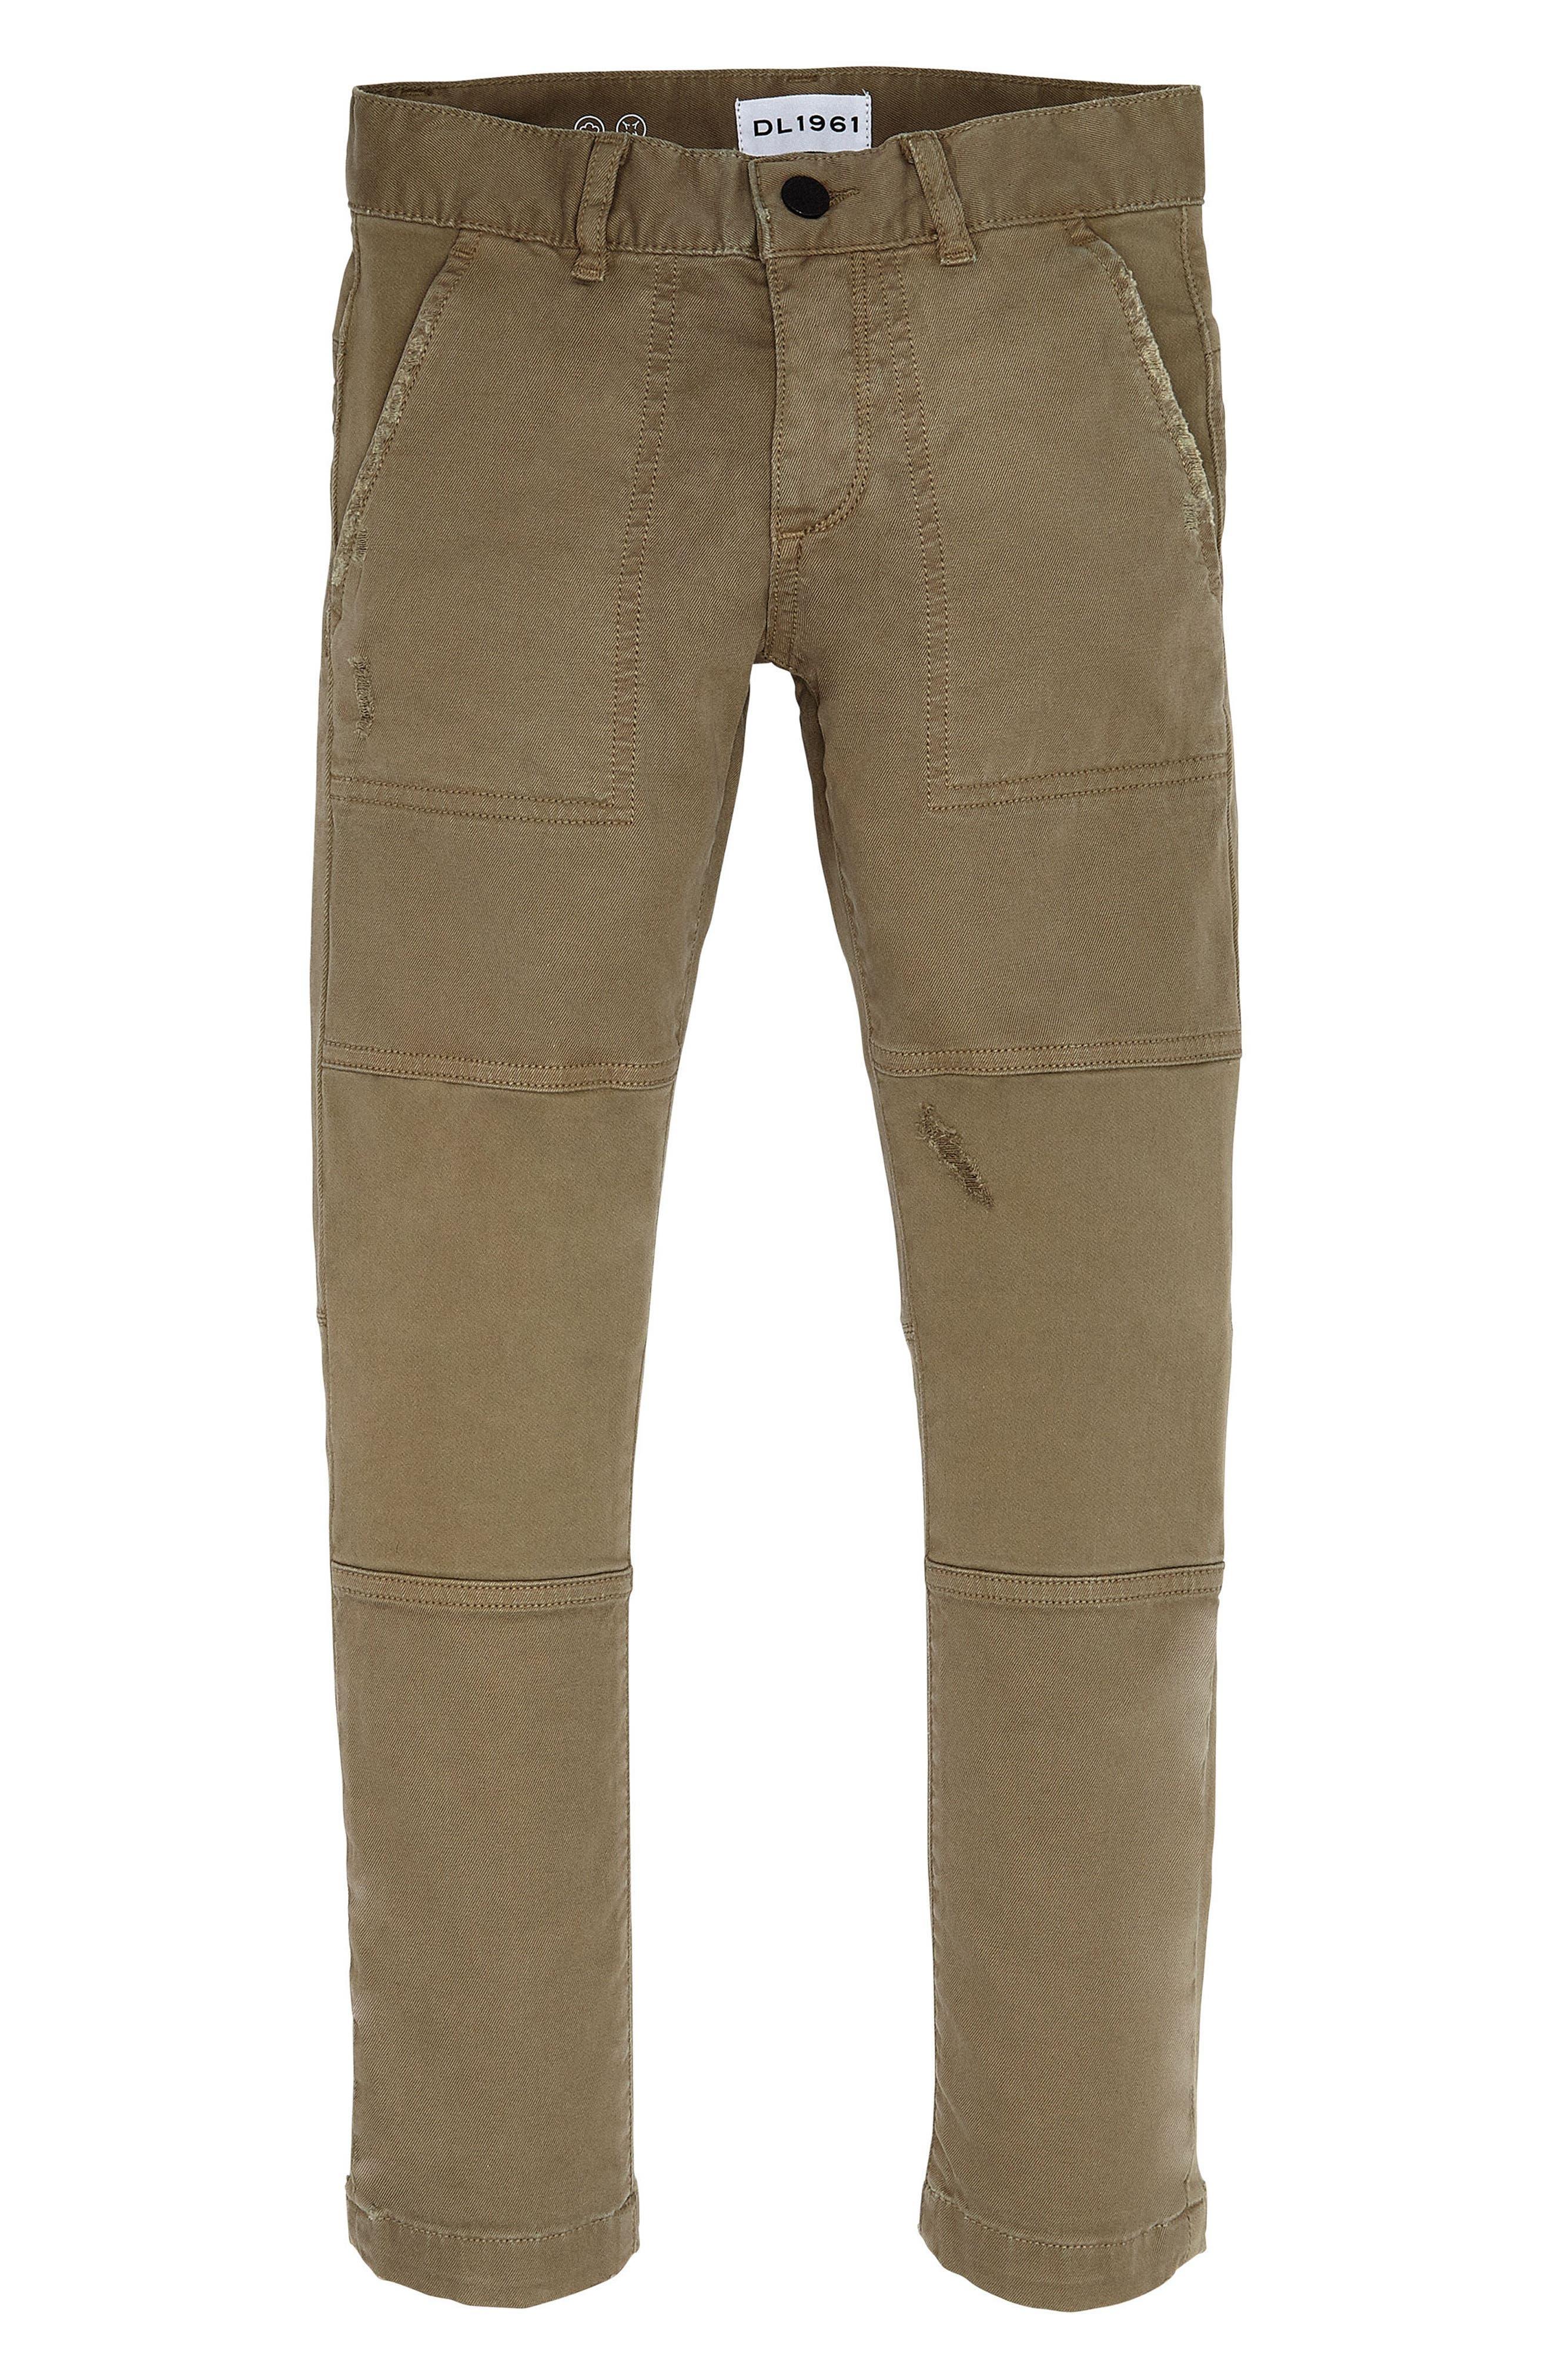 Hawke Skinny Fit Utility Jeans,                         Main,                         color, Regime